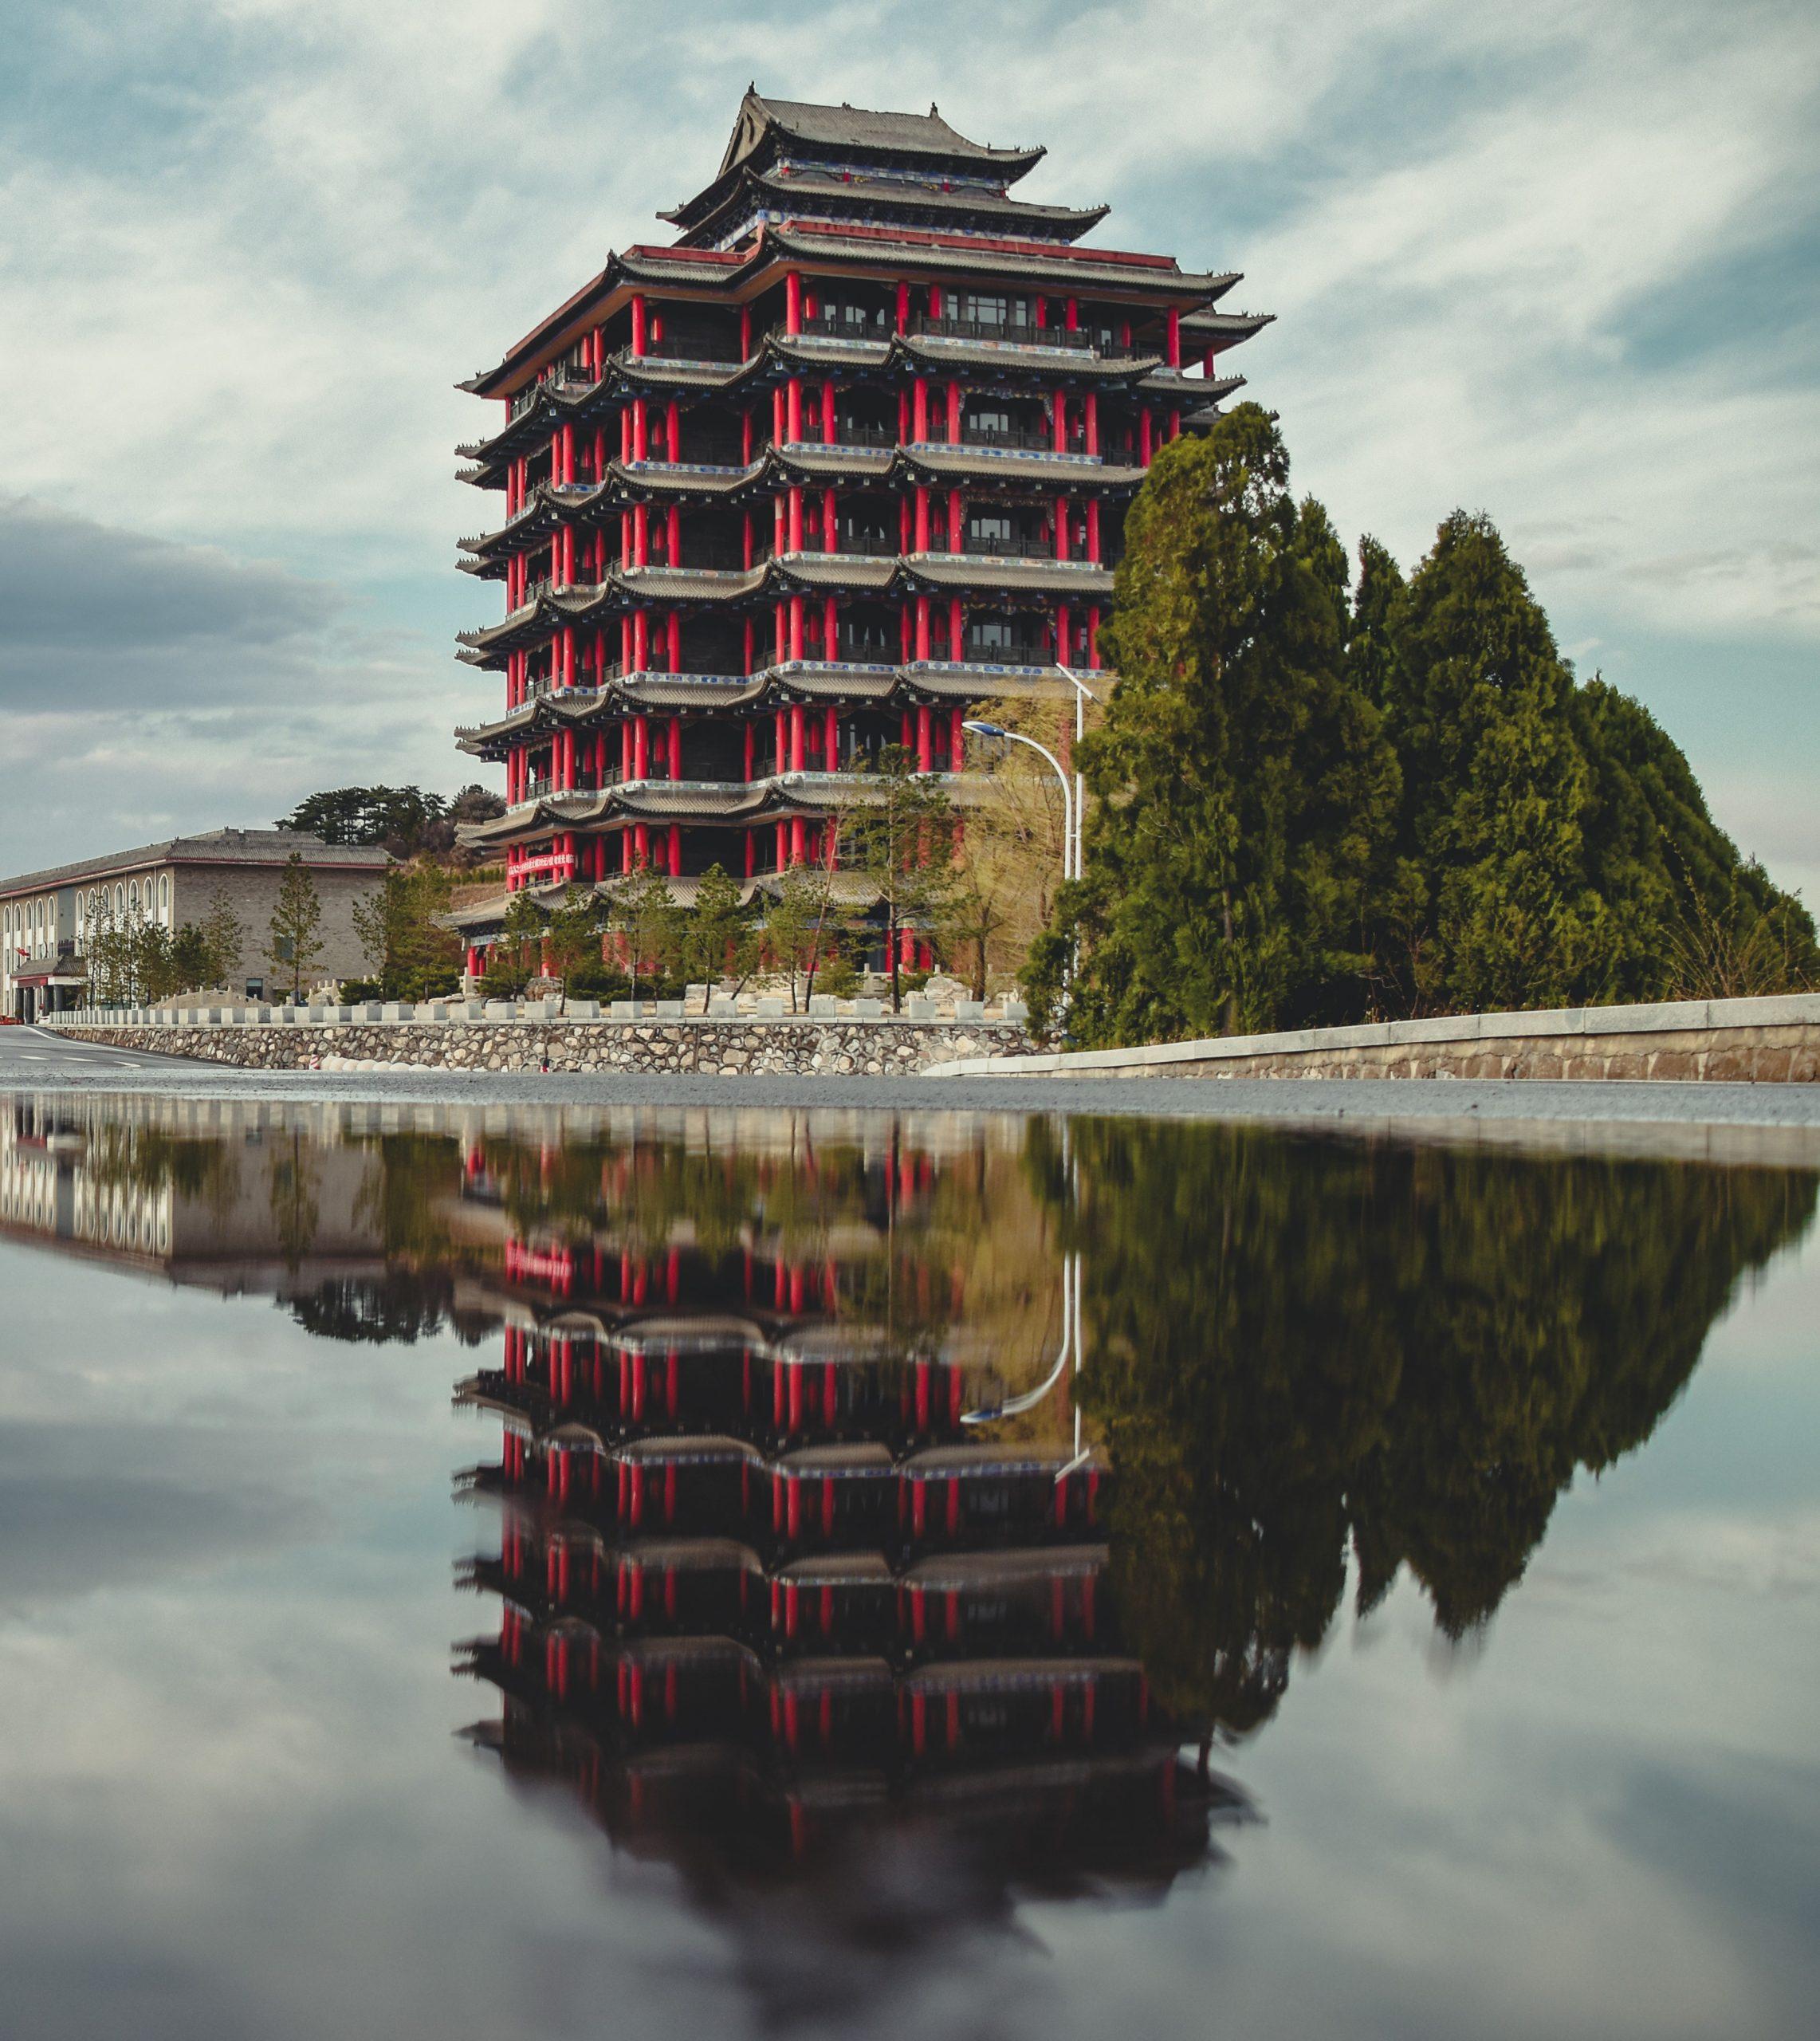 Gray and Brown Pagoda symbolizing International Studies